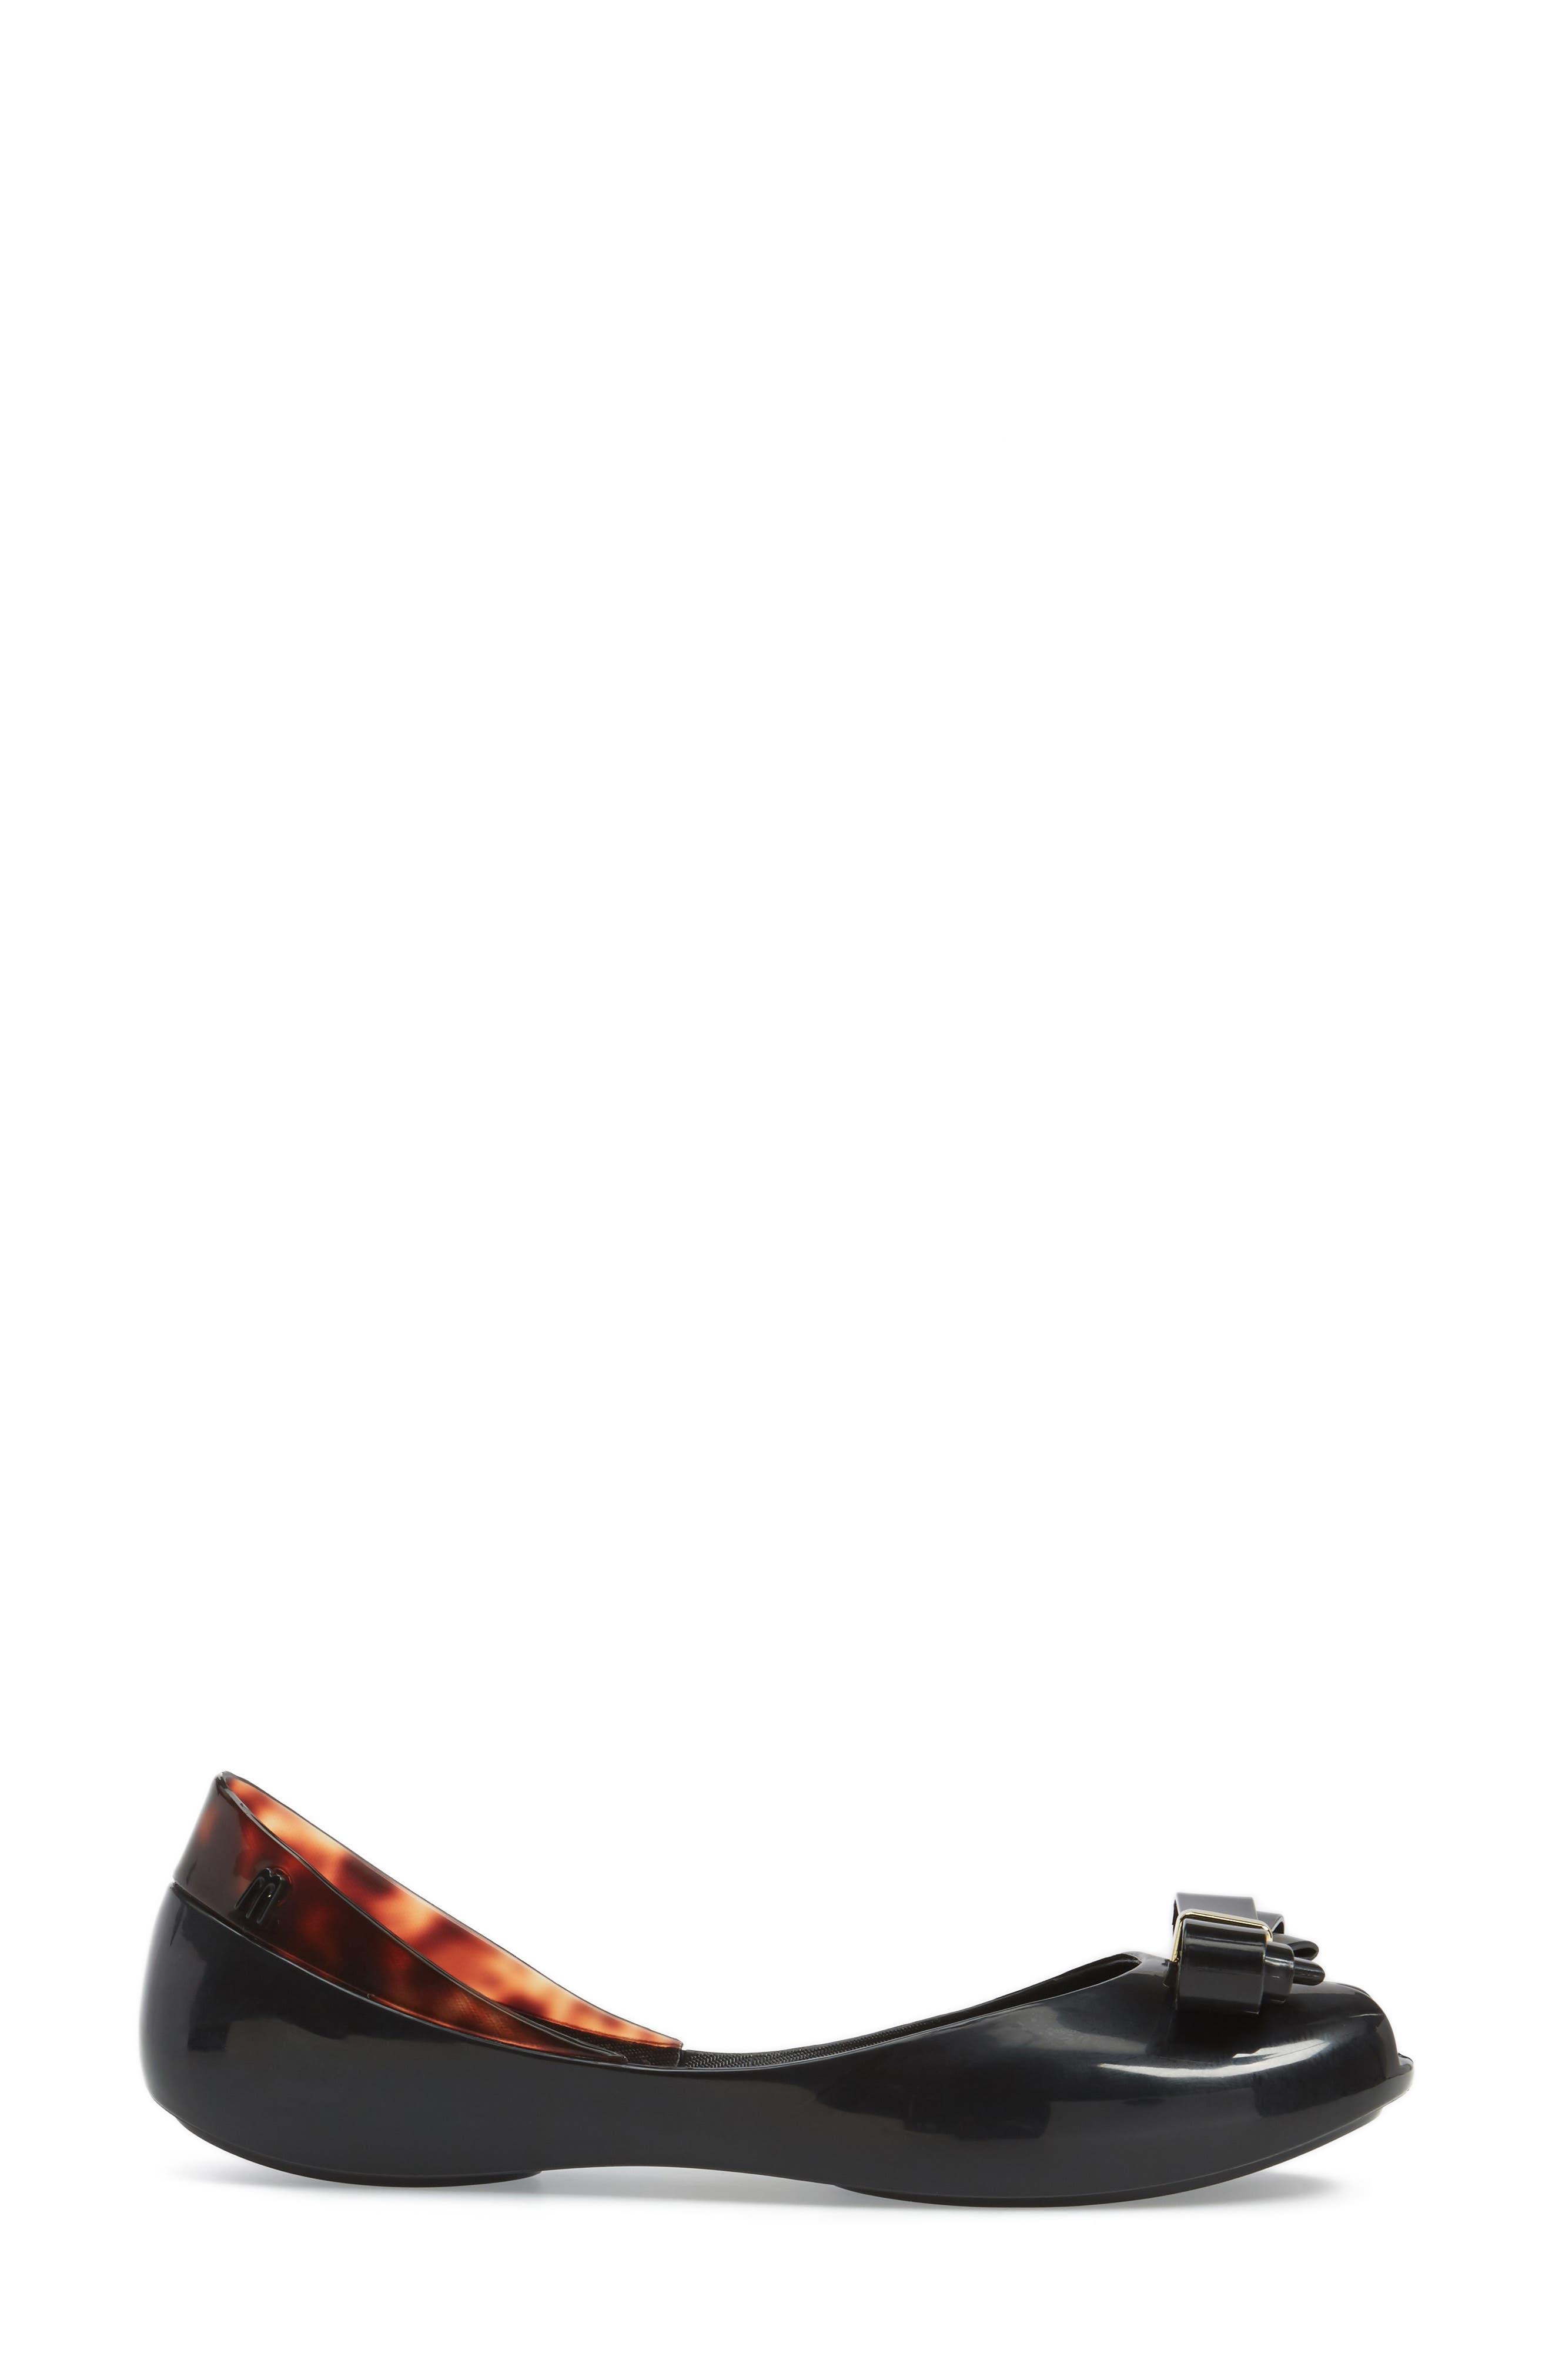 MELISSA, Queen VI Peep Toe Flat, Alternate thumbnail 3, color, 001